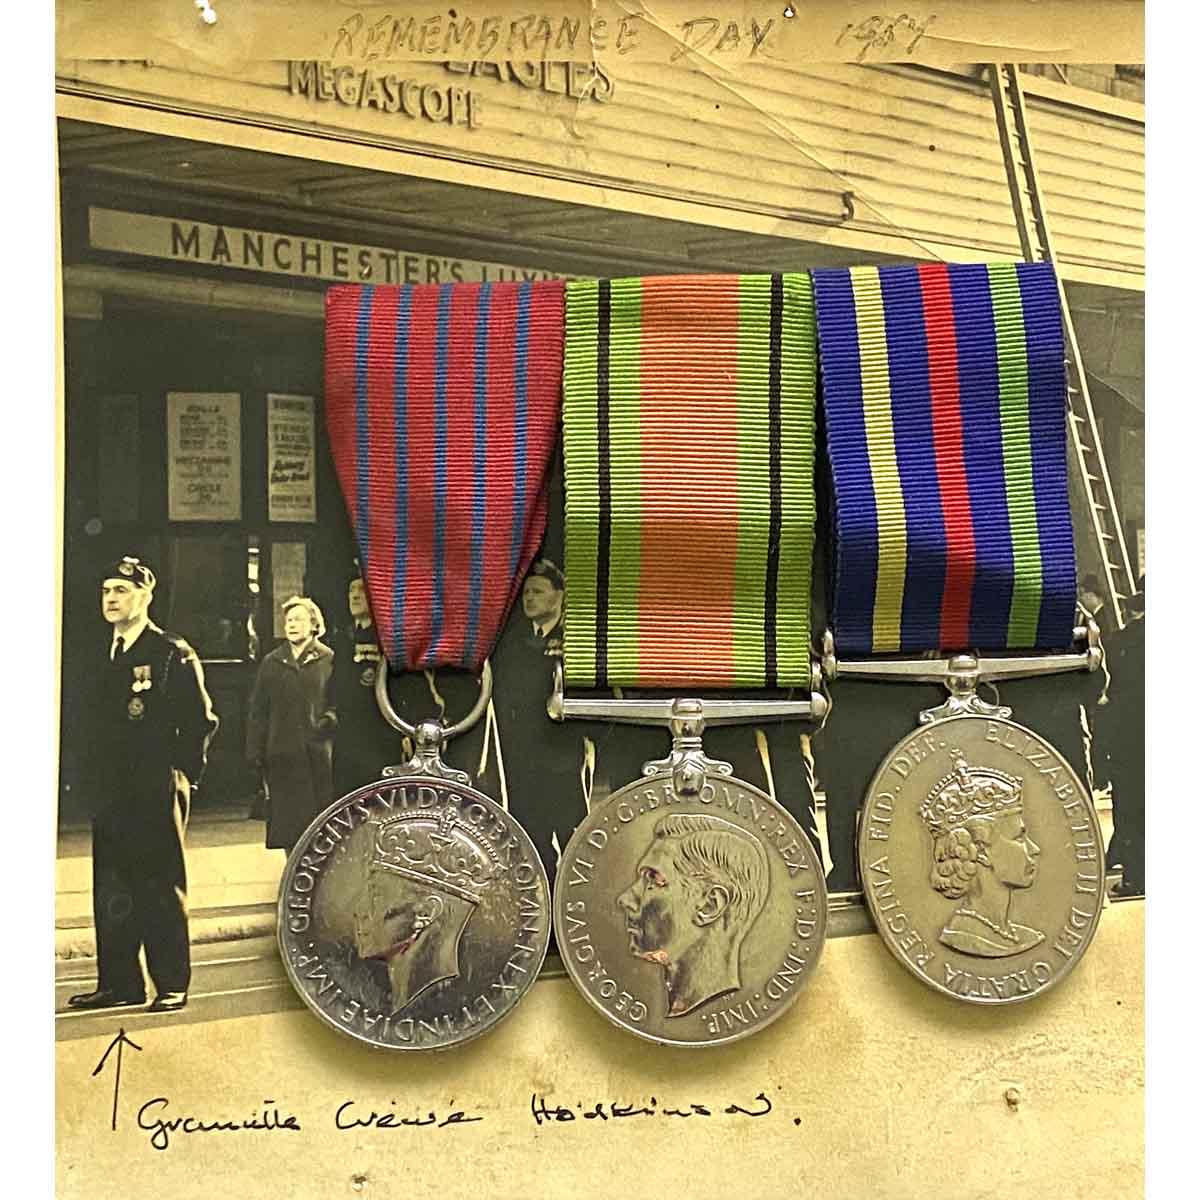 George Medal, Manchester Blitz 1